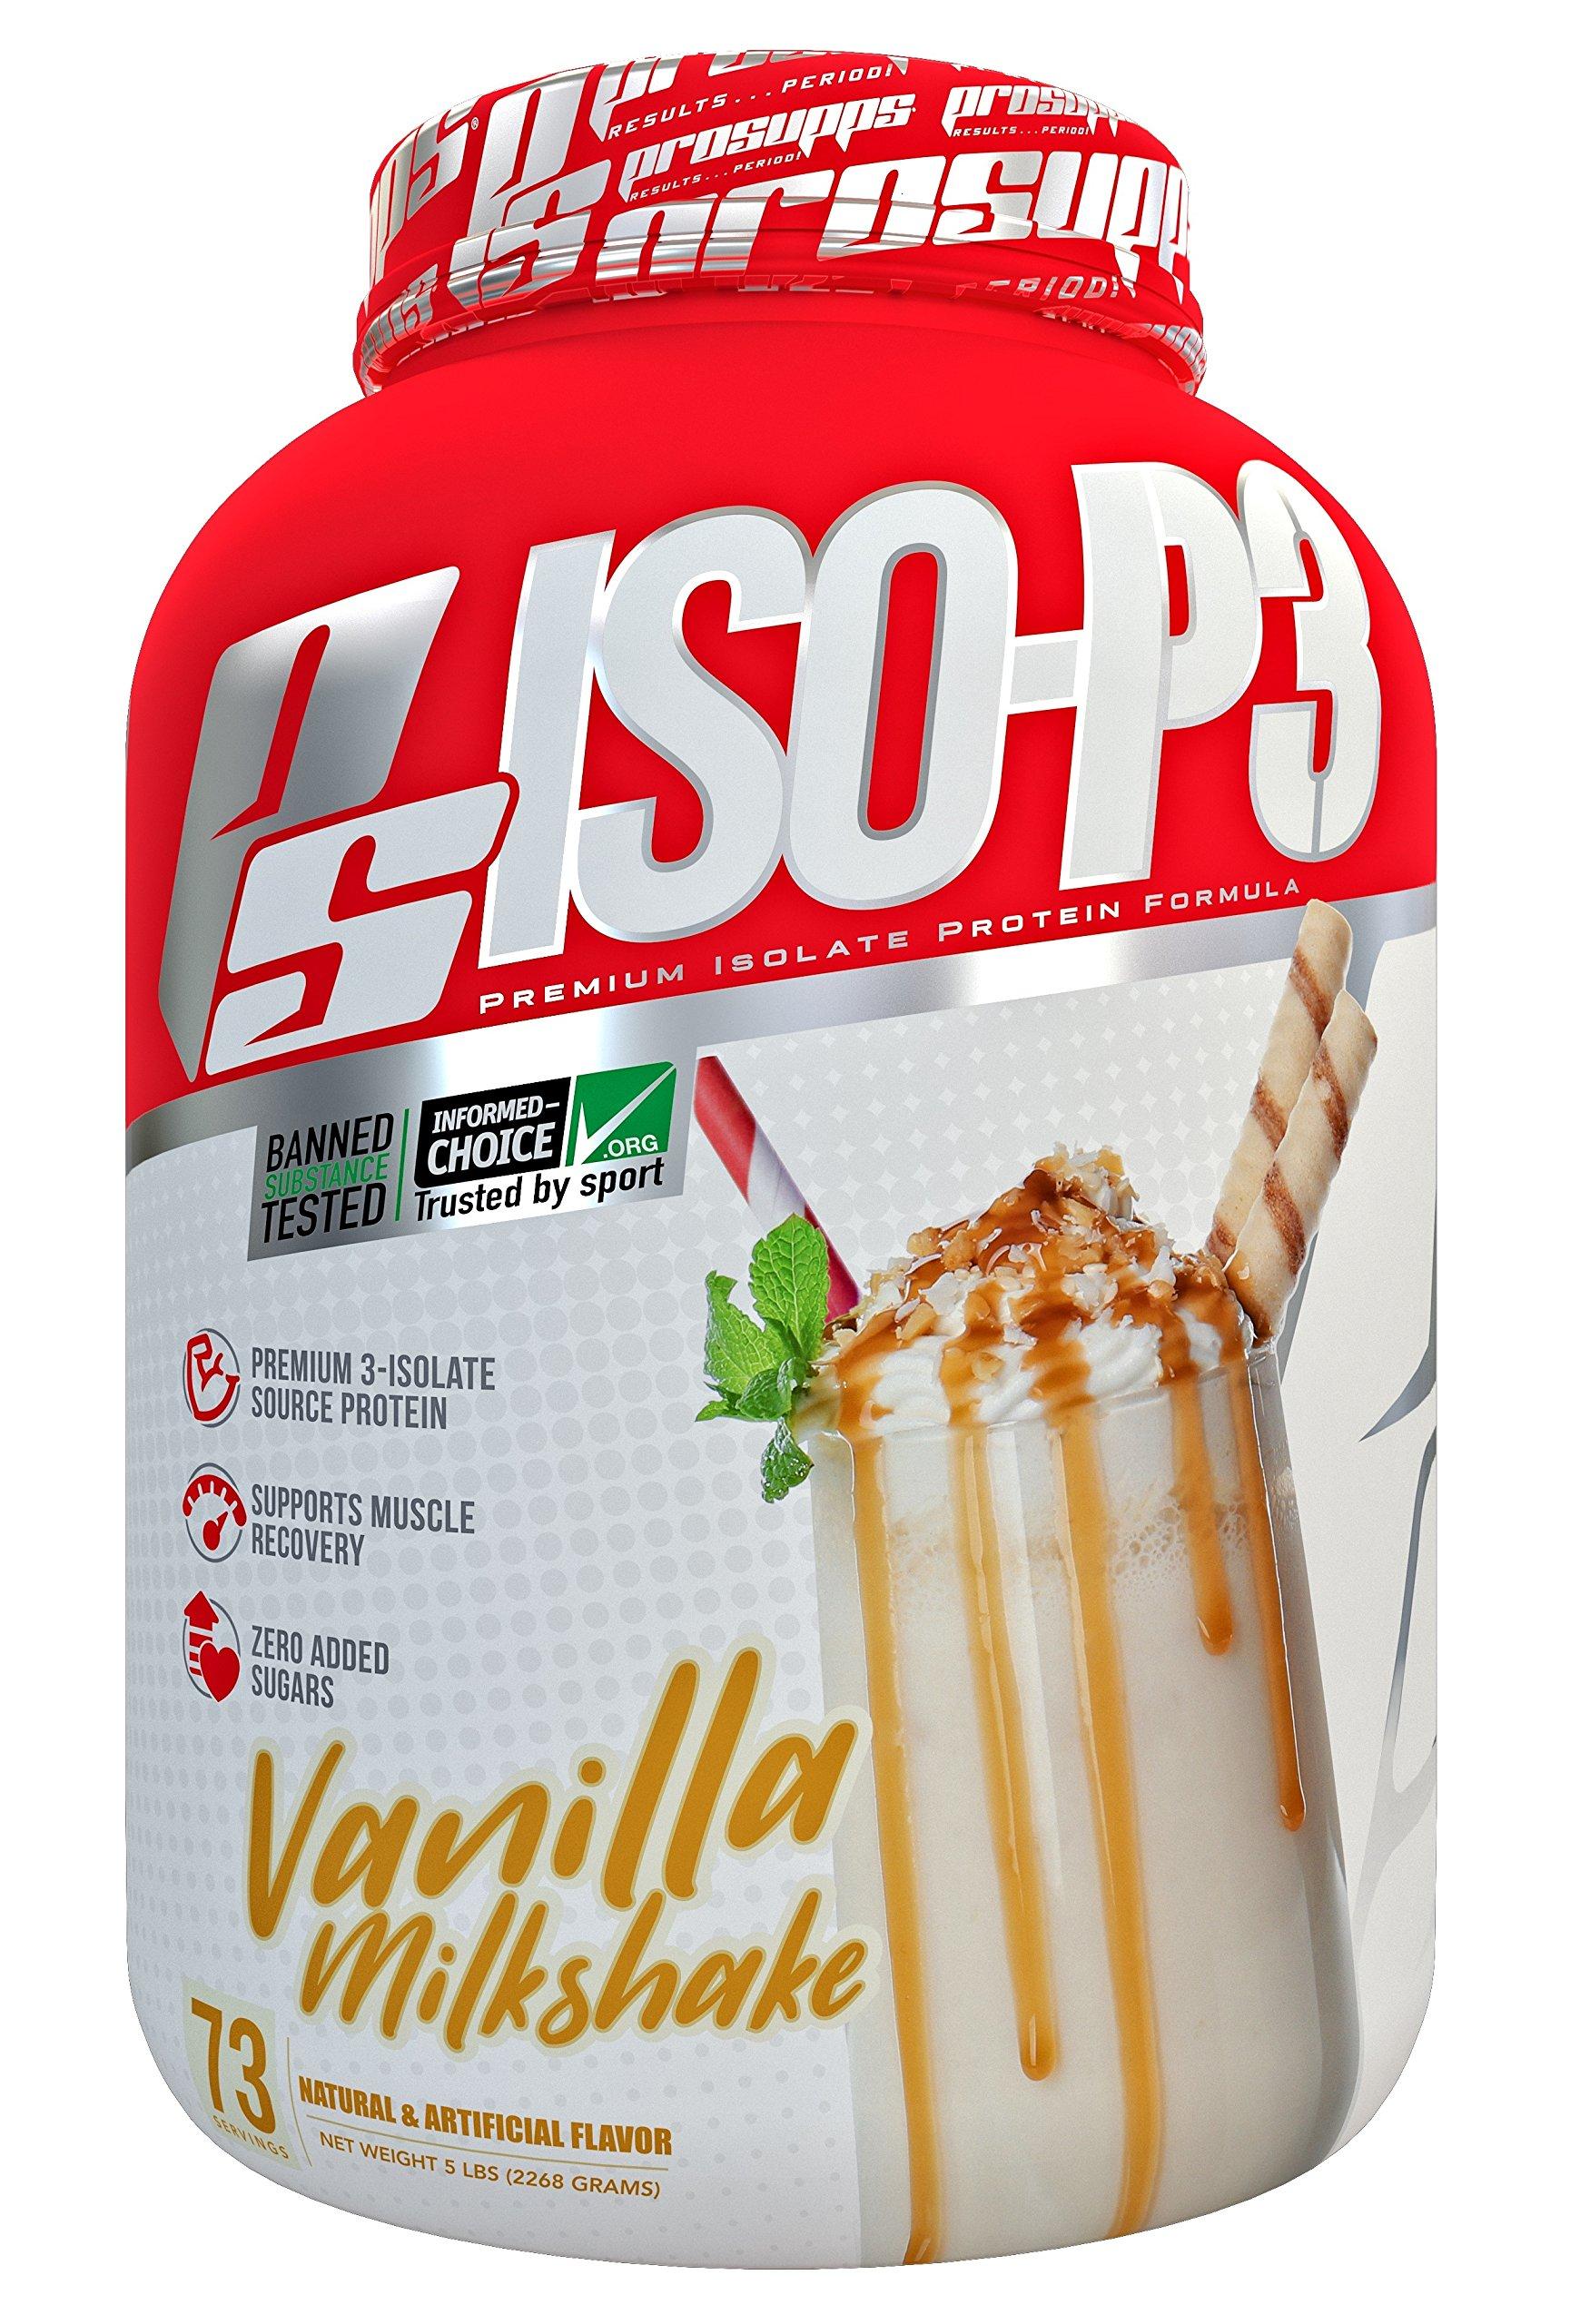 Pro Supps Iso-p3 Premium Isolate Protein Formula, Vanilla Milkshake, 5 Pound